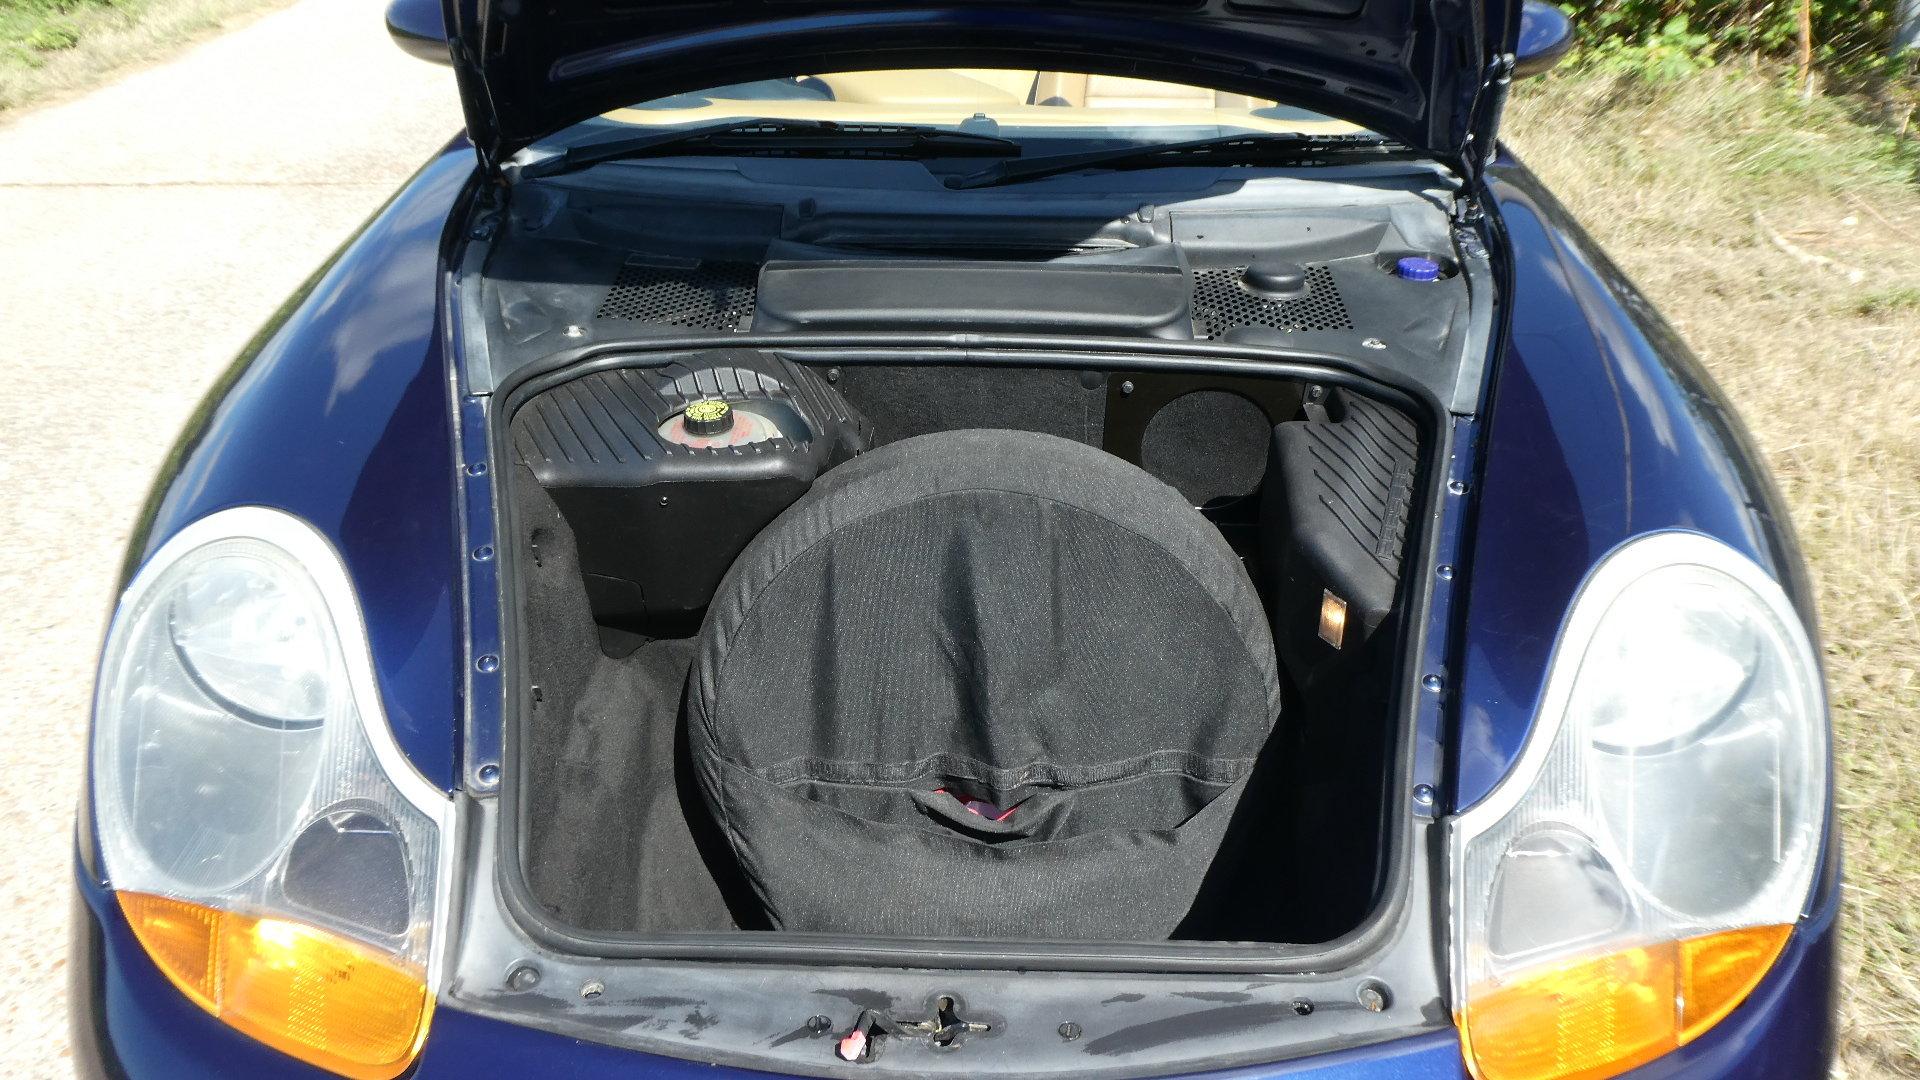 2001 Porsche Boxster S  3.2 litre Convertible  SOLD (picture 6 of 6)